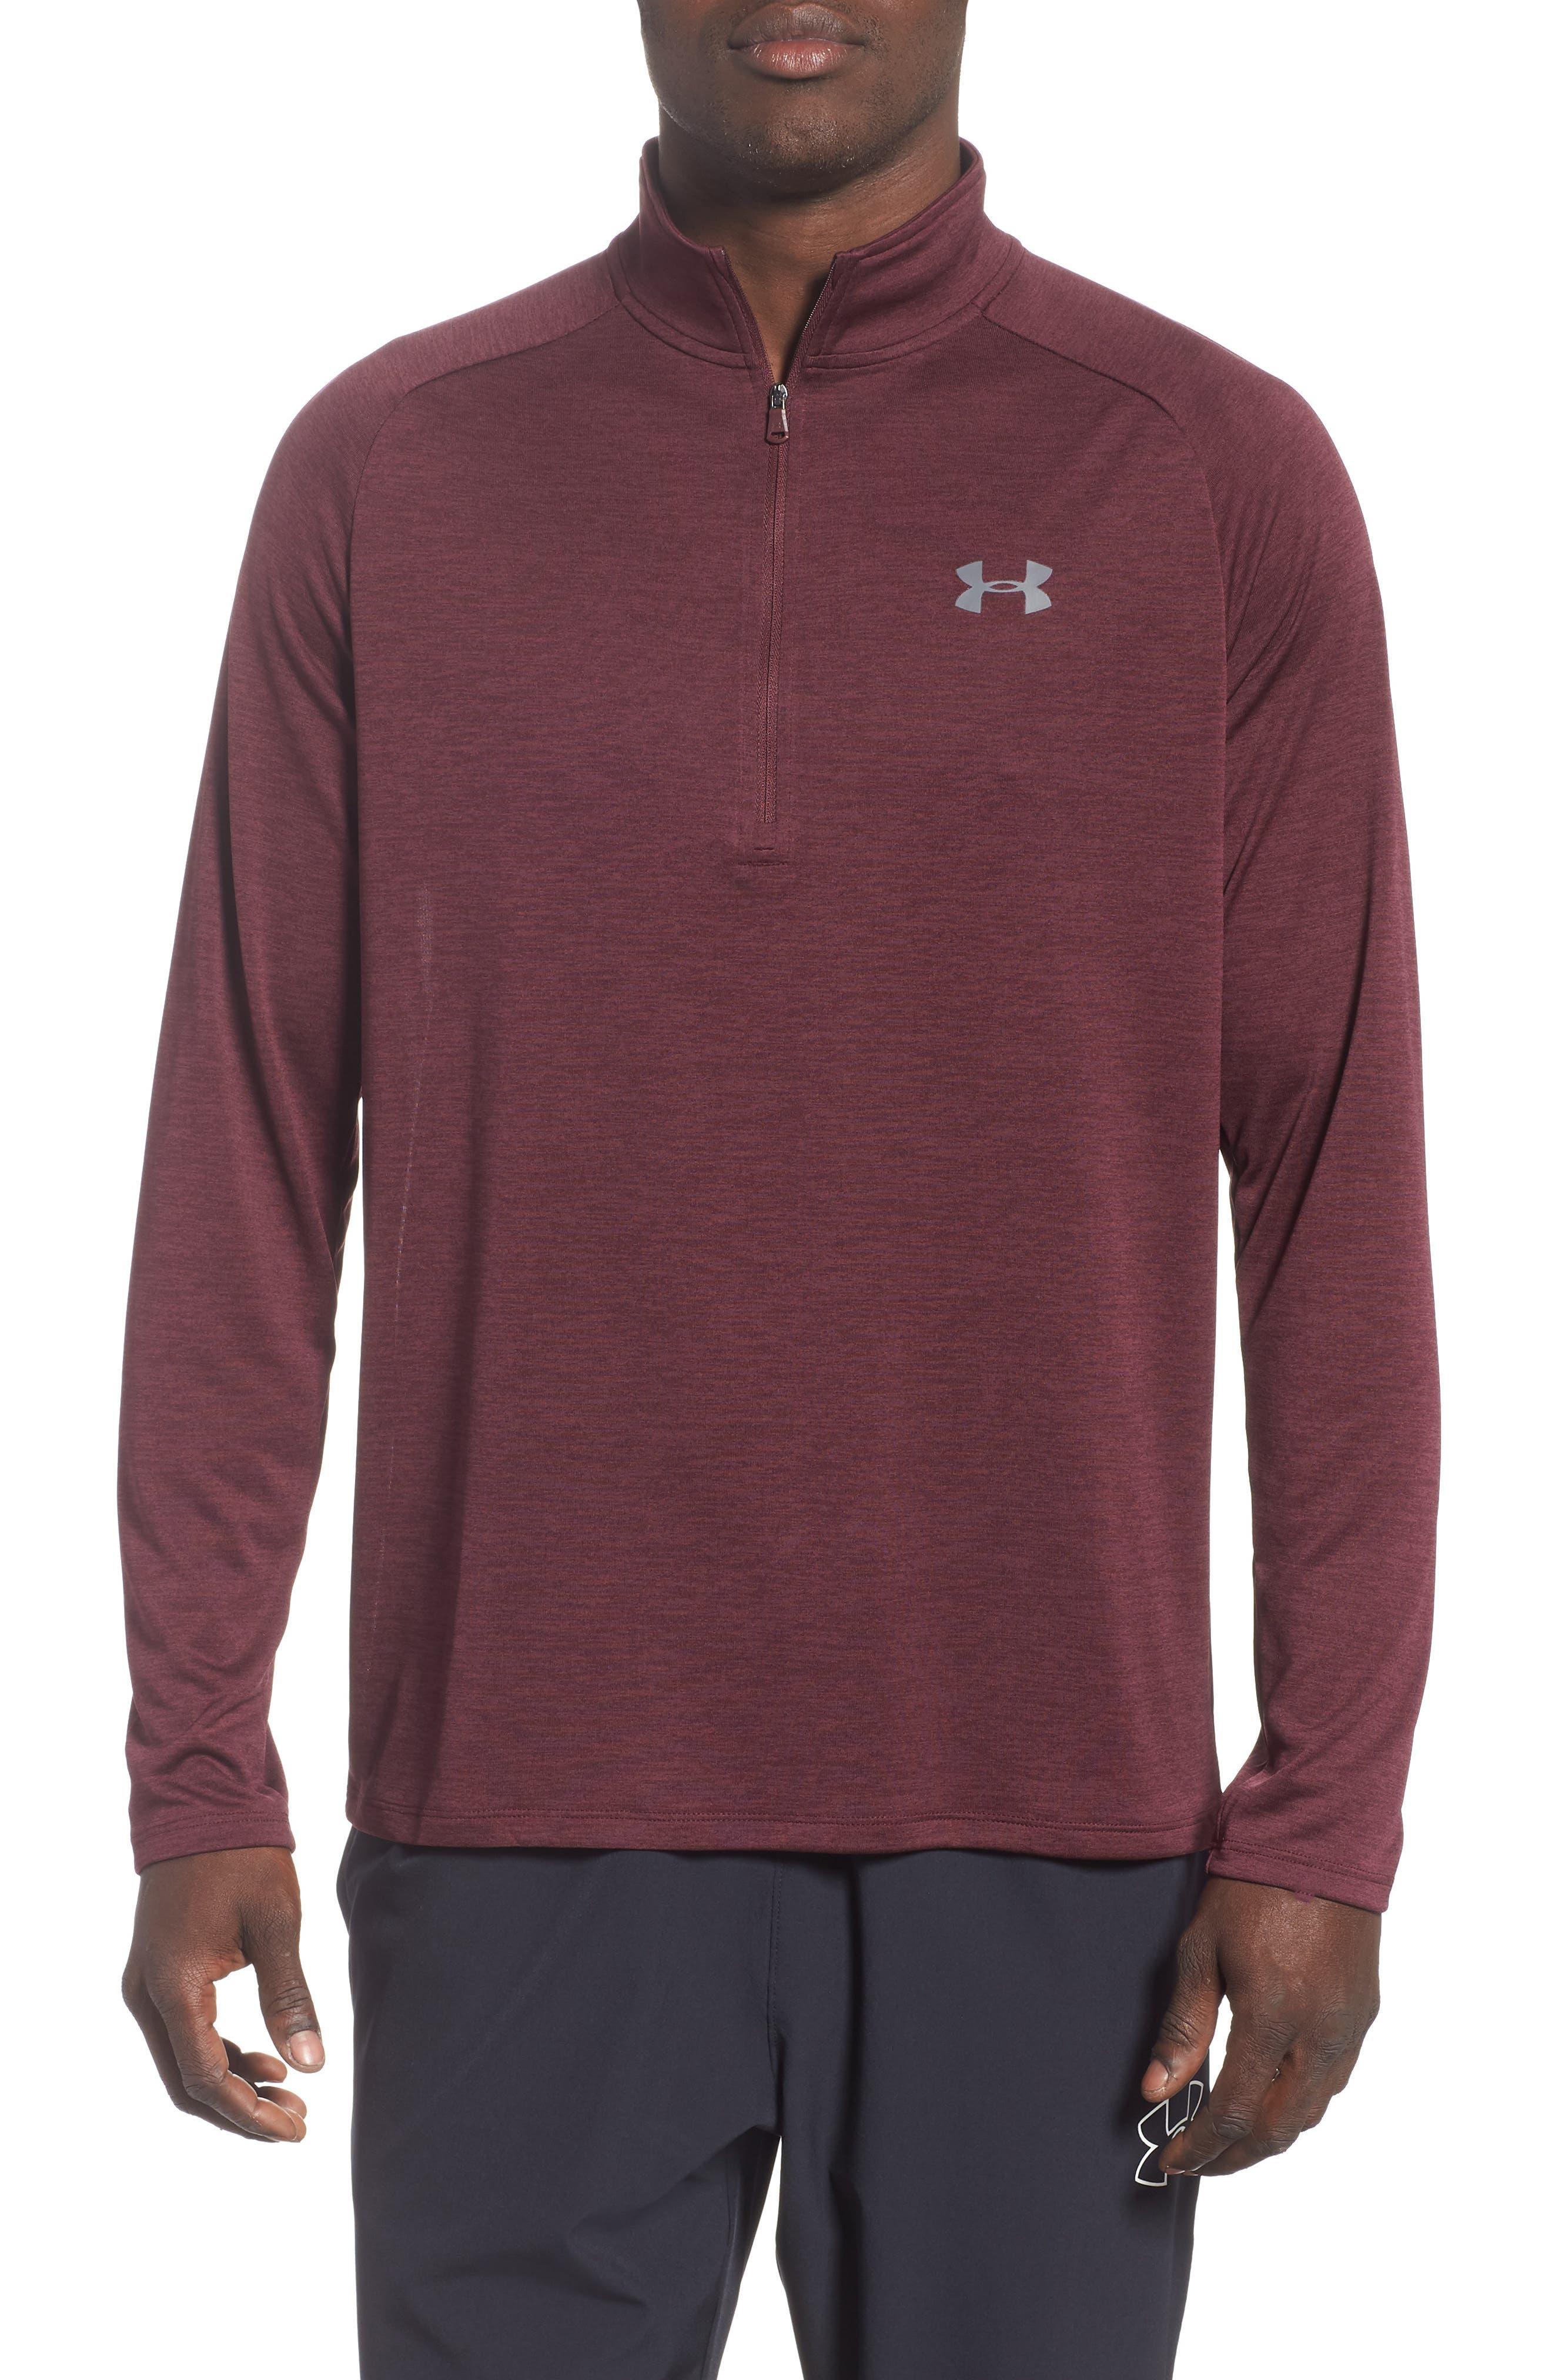 UNDER ARMOUR,                             Tech Half Zip Sweatshirt,                             Main thumbnail 1, color,                             600